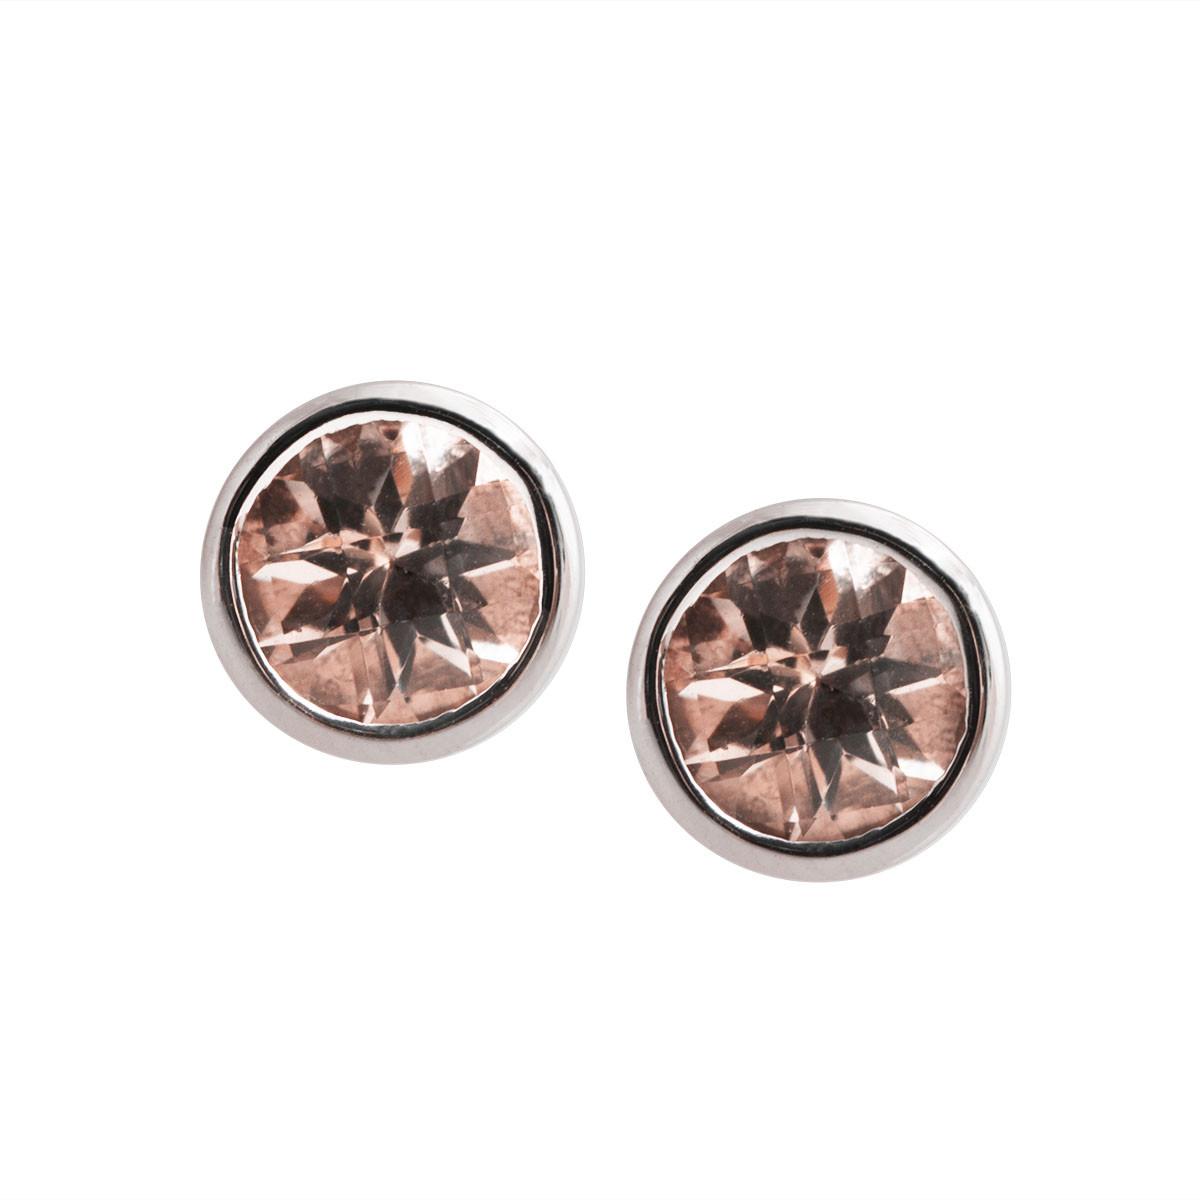 New 0.82 CTW Morganite Stud Earrings